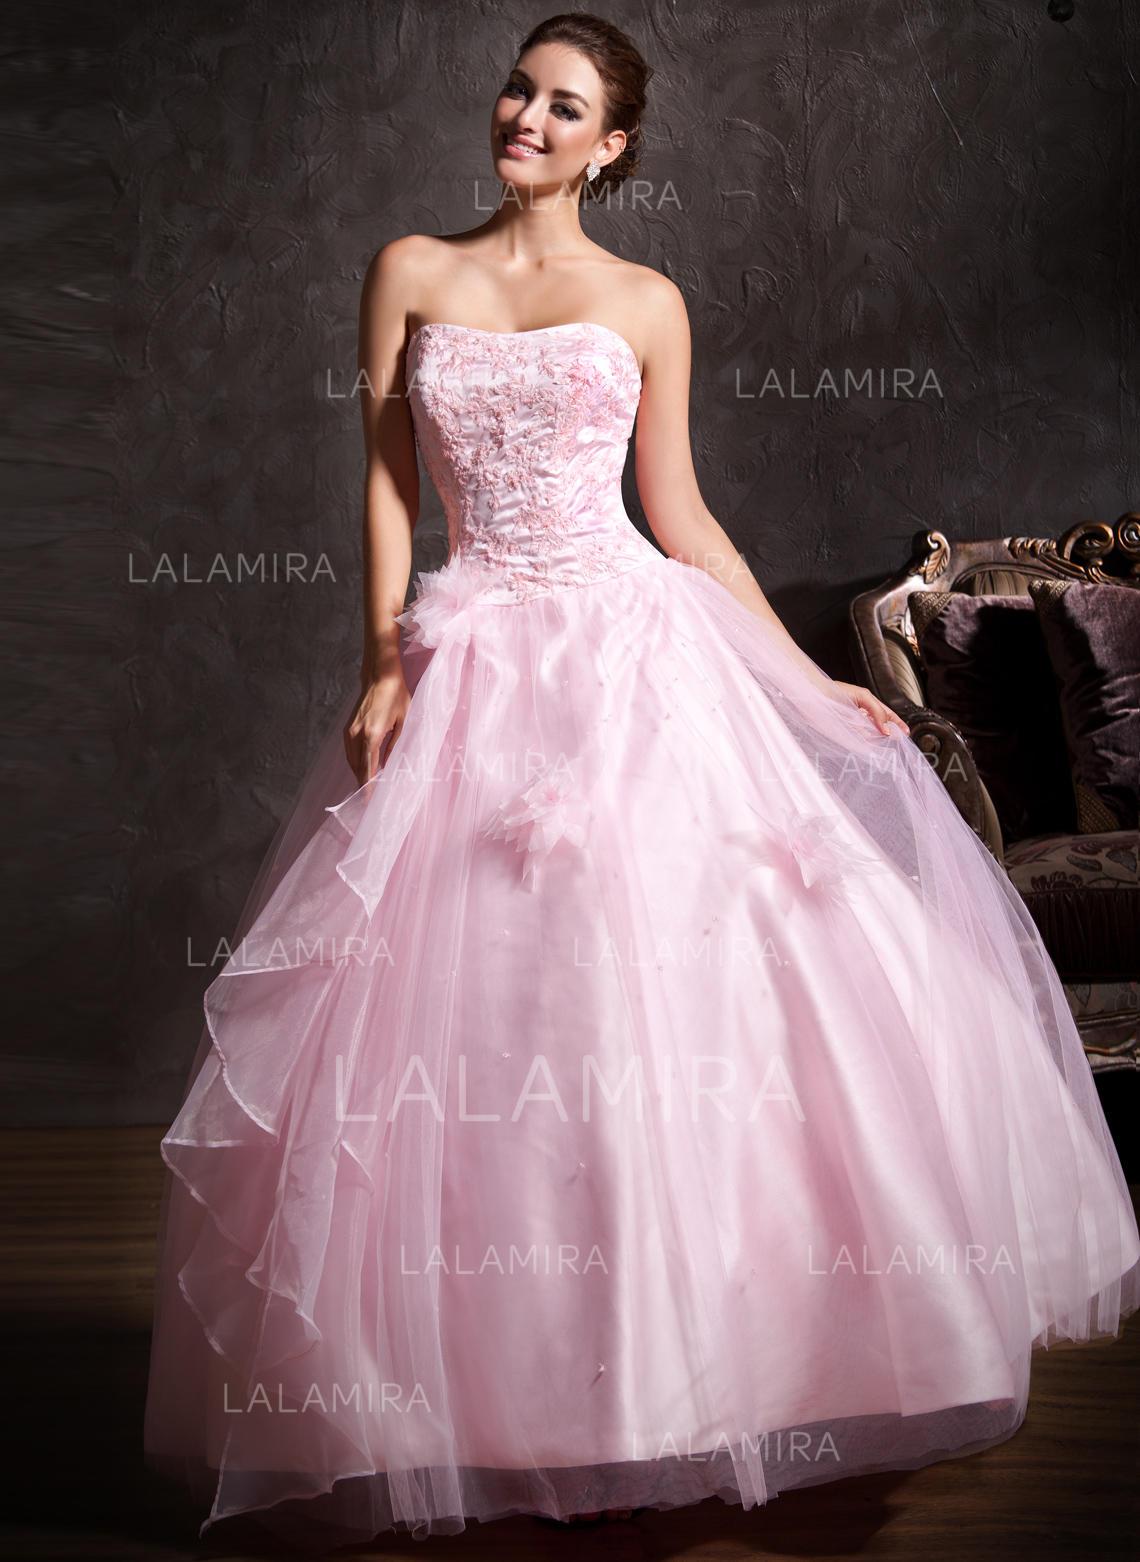 Increíble Lace Sweetheart Wedding Dresses Ideas Ornamento ...